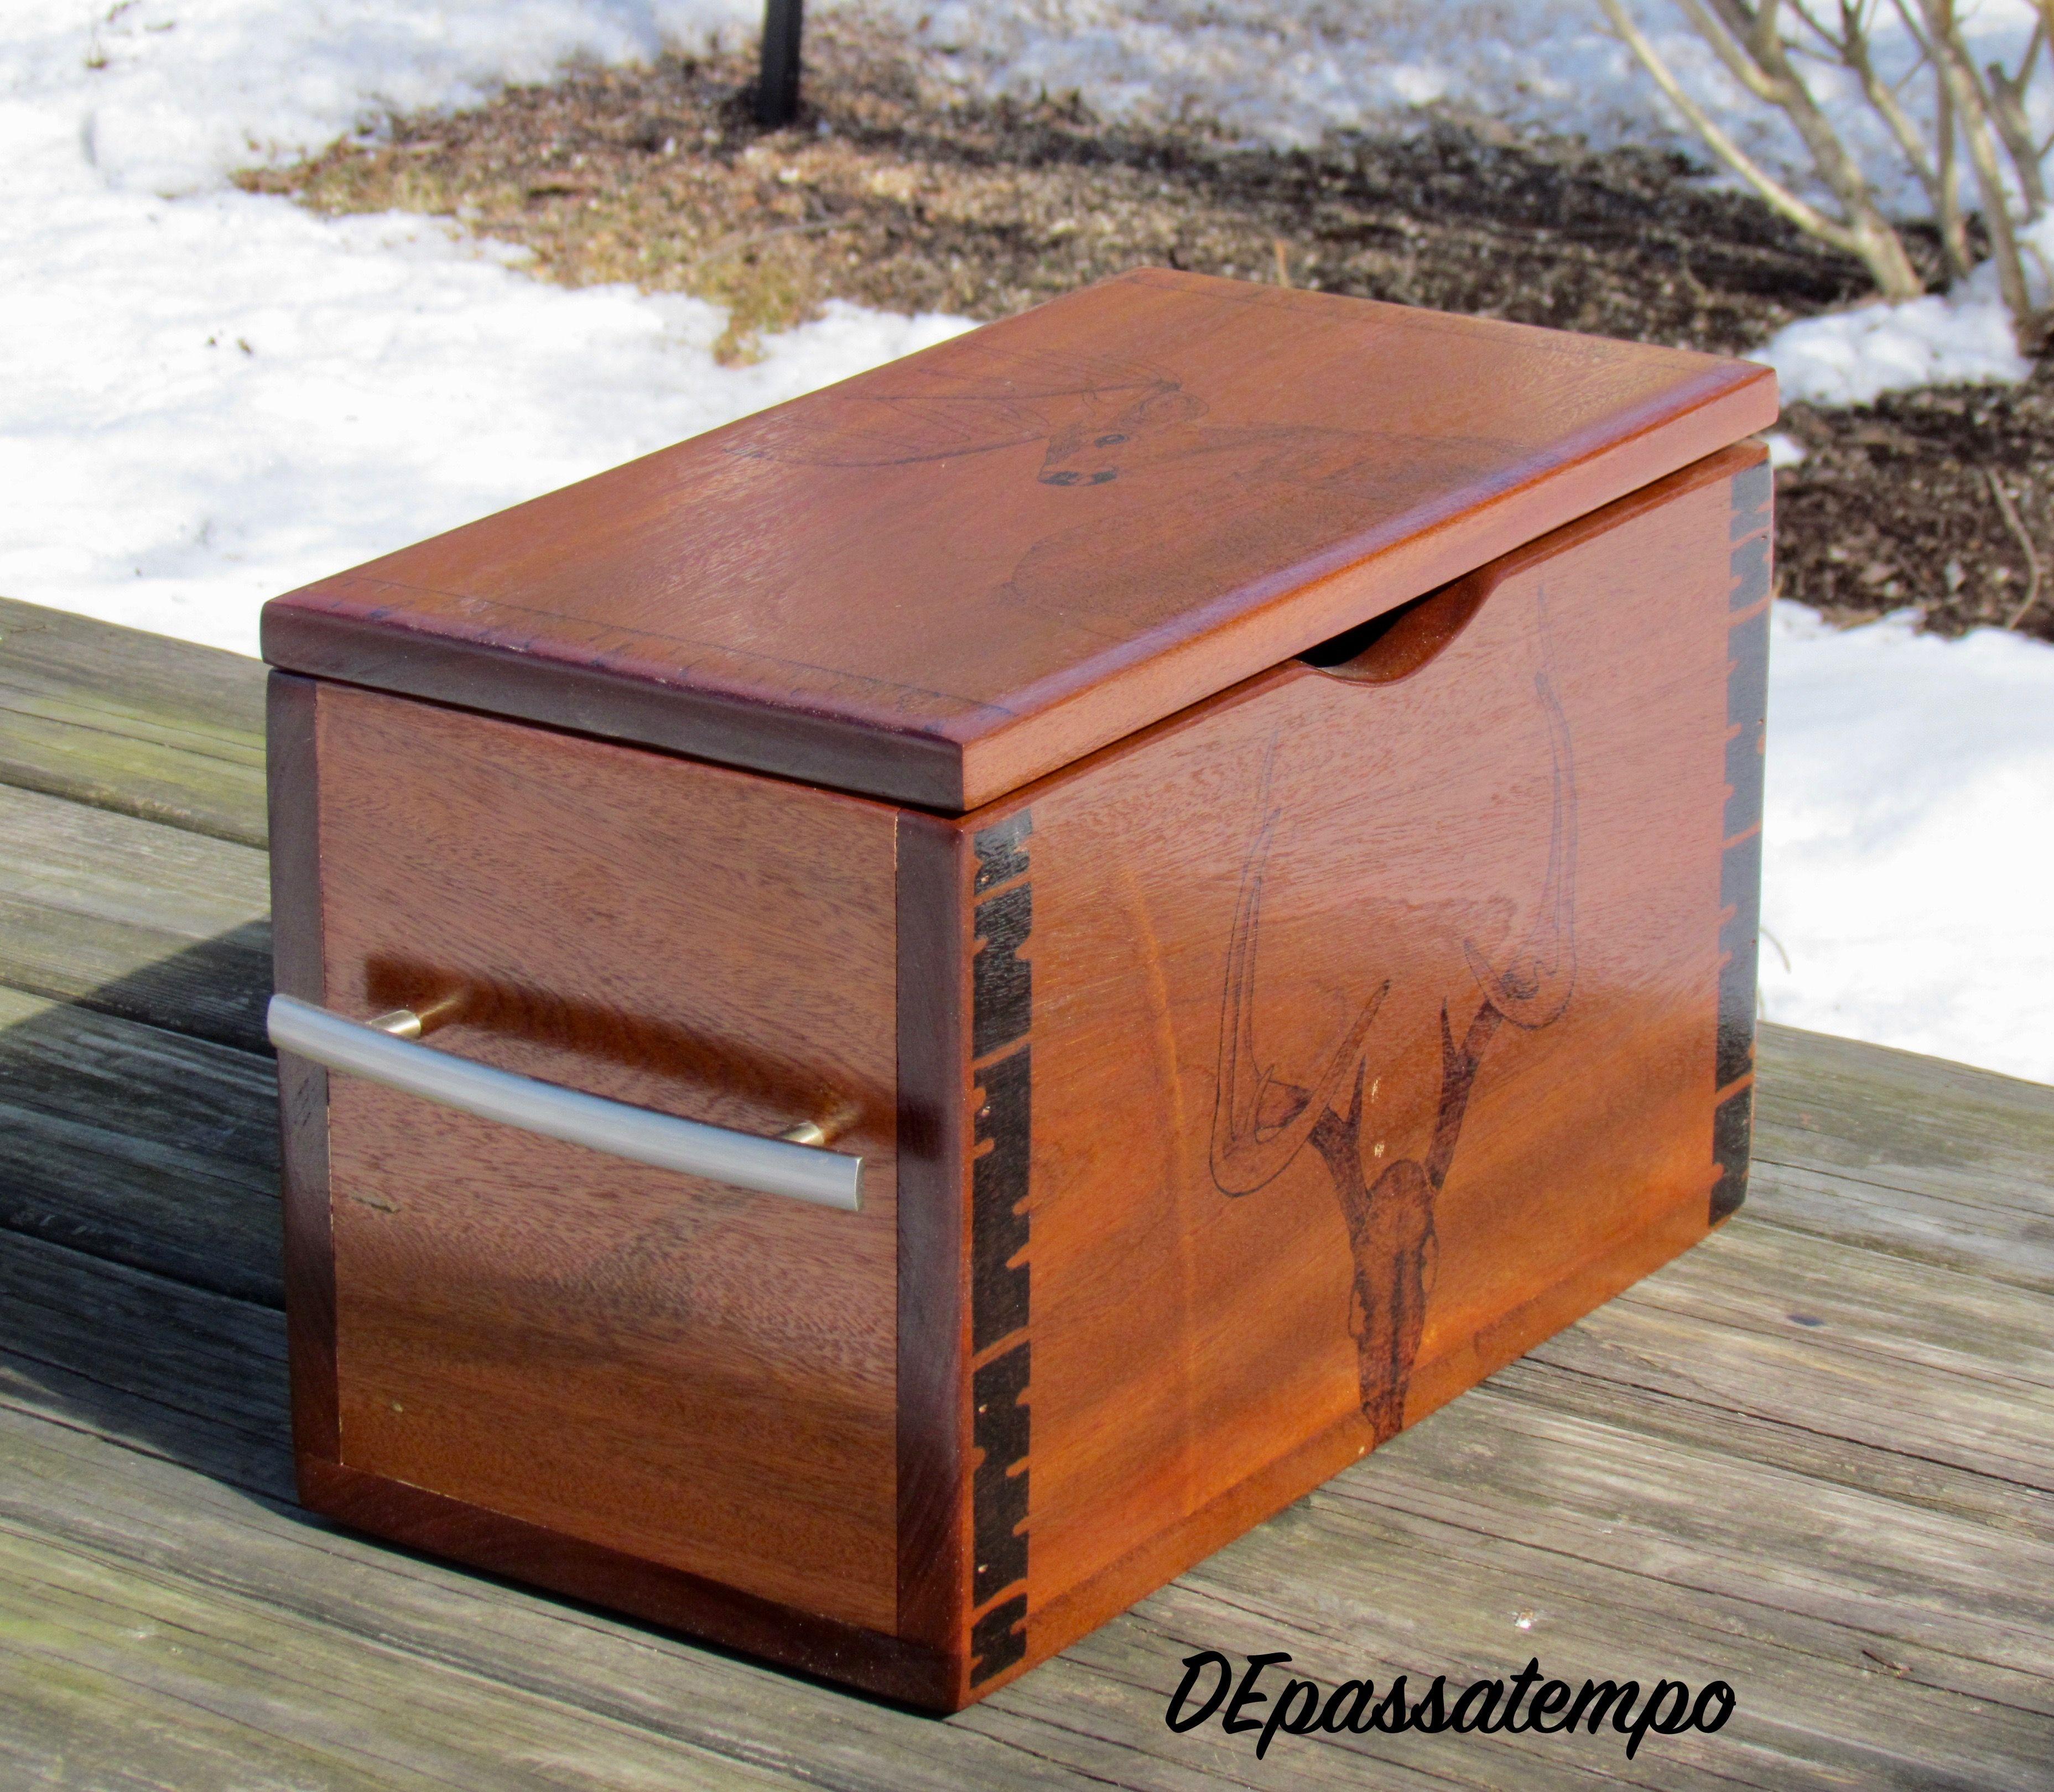 Mahogany box with handles. Deer Woodburning on top and